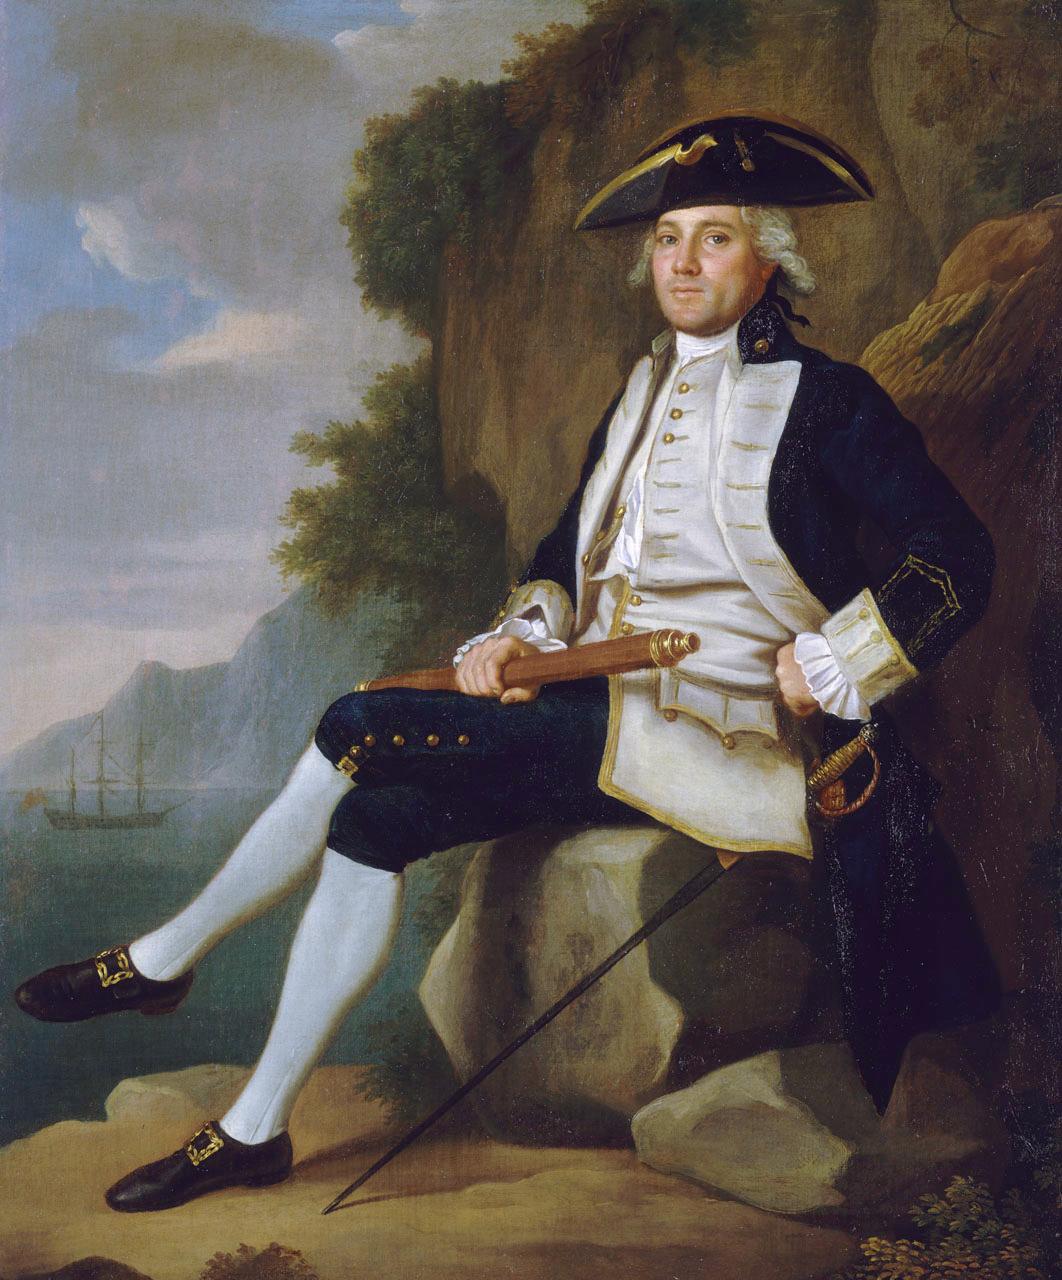 [Imagen: Captain_Edward_Vernon_(1723-1794)._by_Fr...Hayman.jpg]